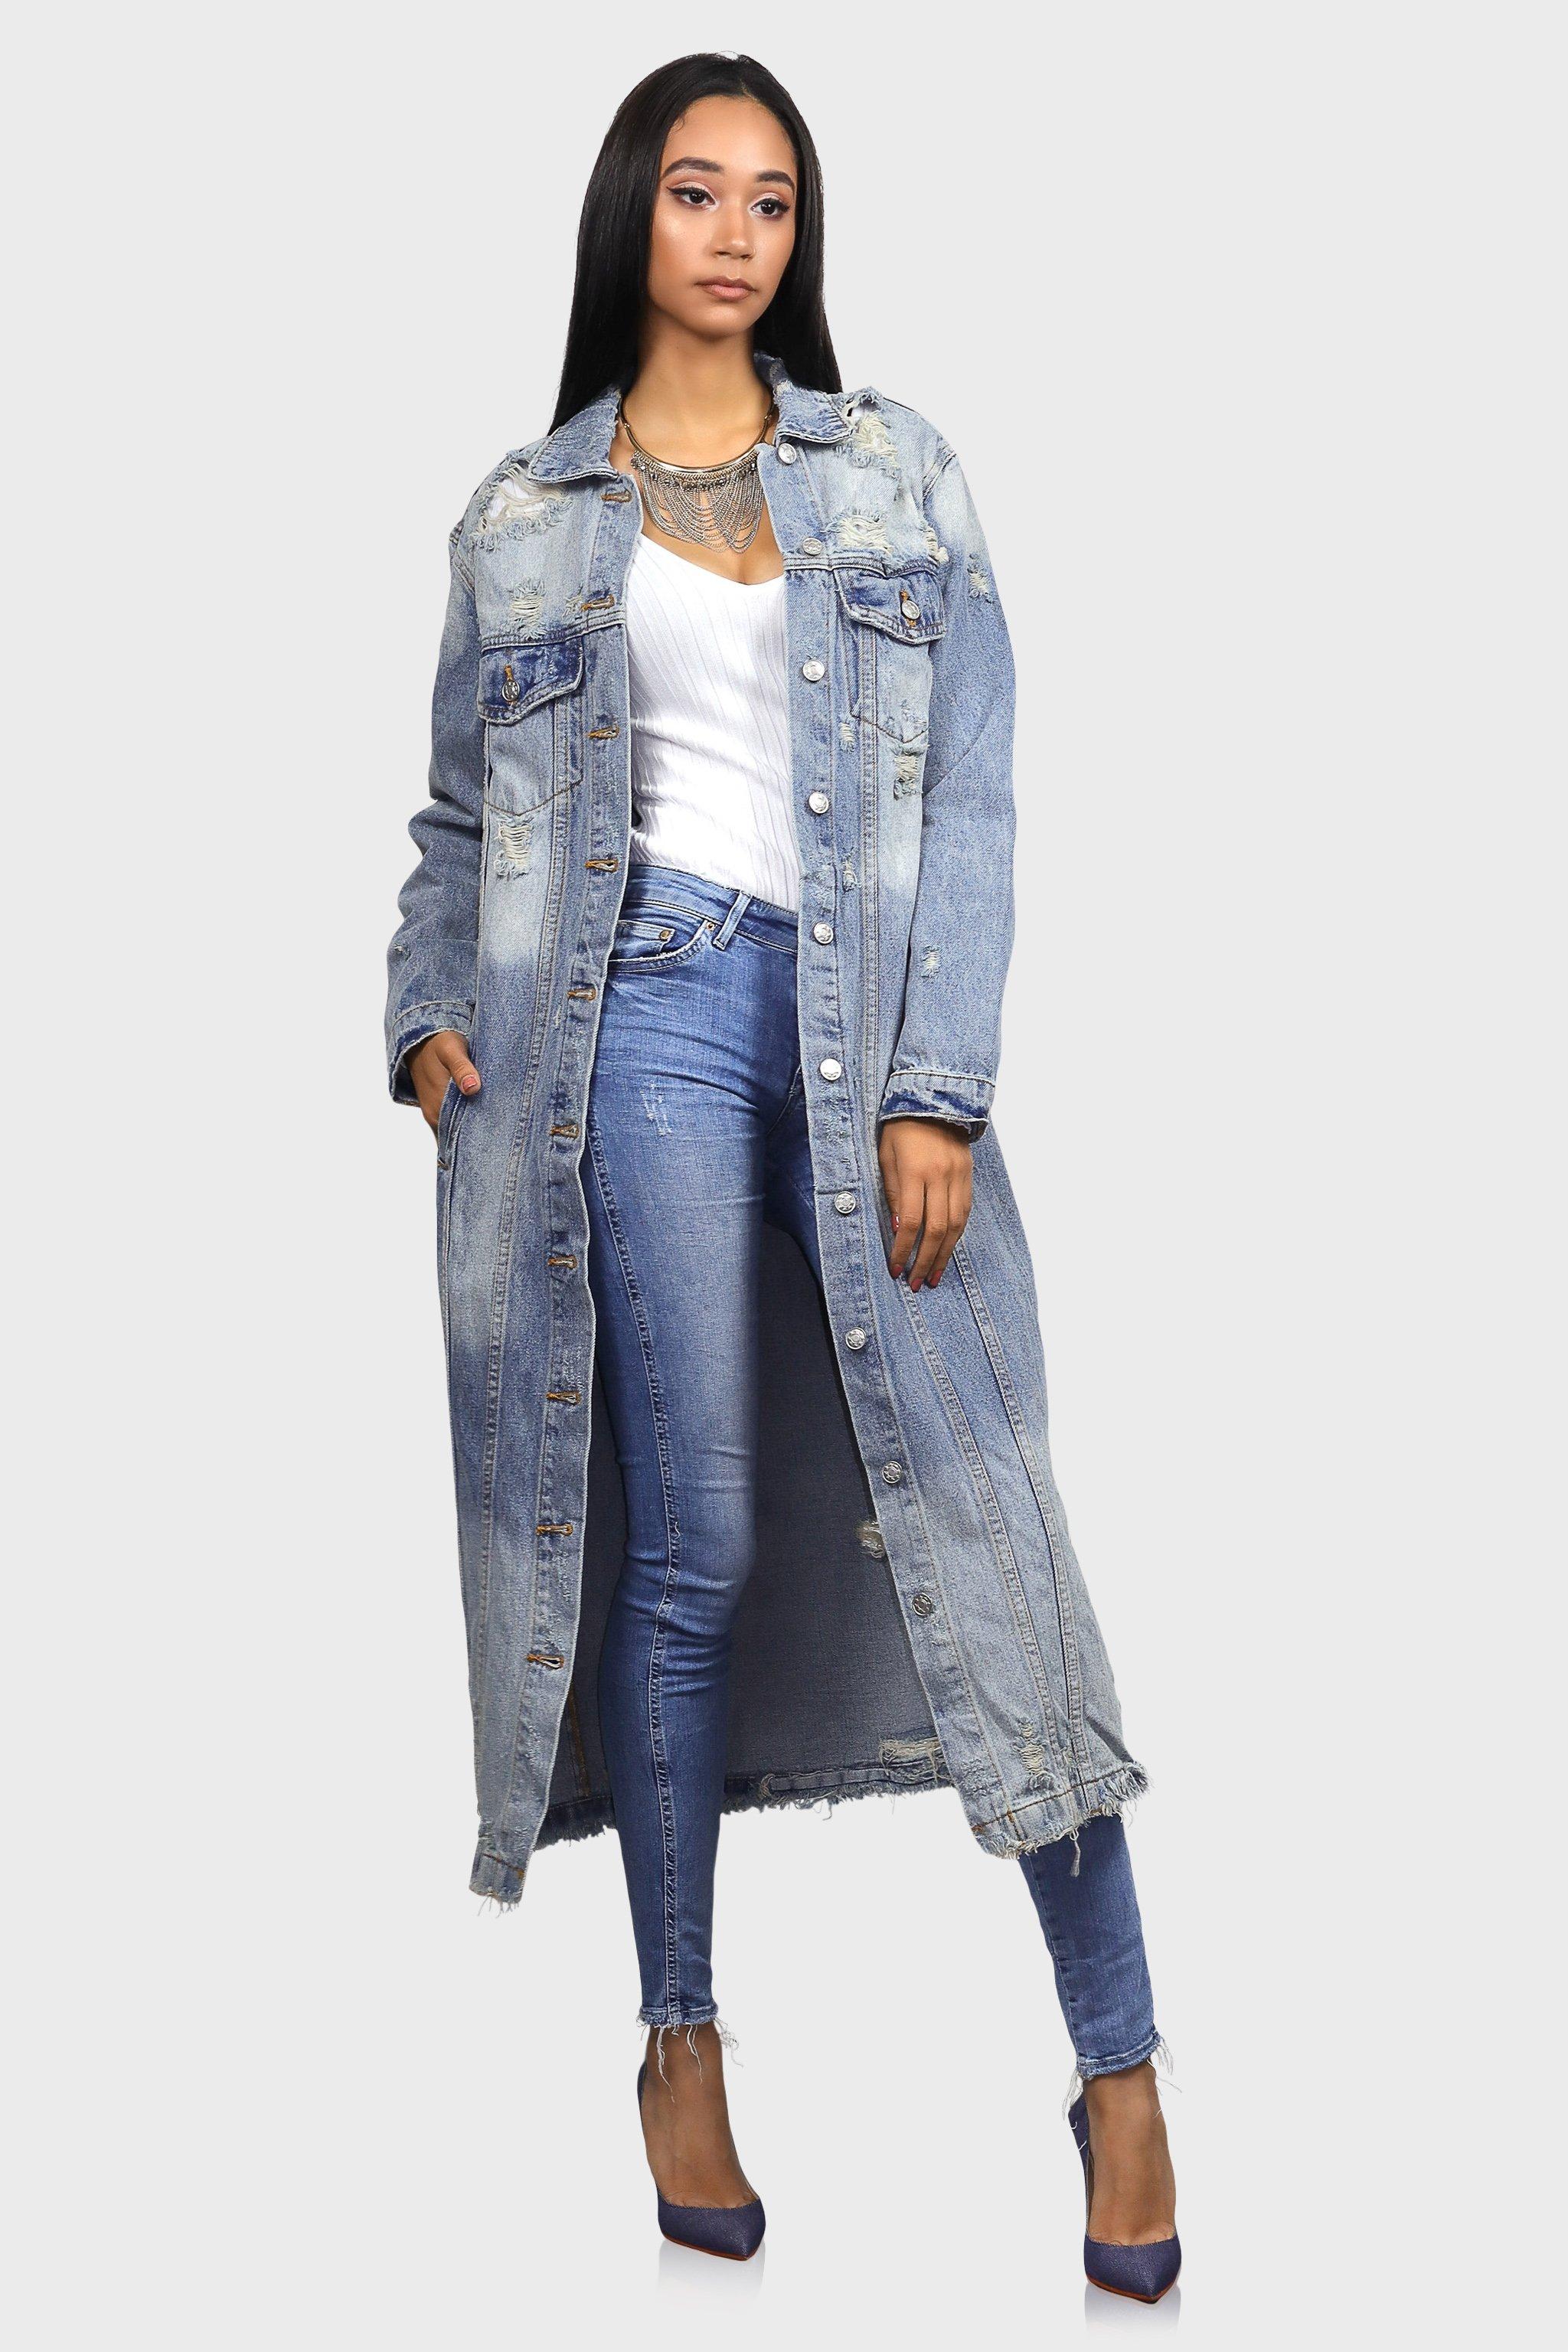 Dripping In Denim Long Denim Jacket Long Denim Jacket Blue Jean Jacket Outfits Denim Jacket [ 3072 x 2048 Pixel ]